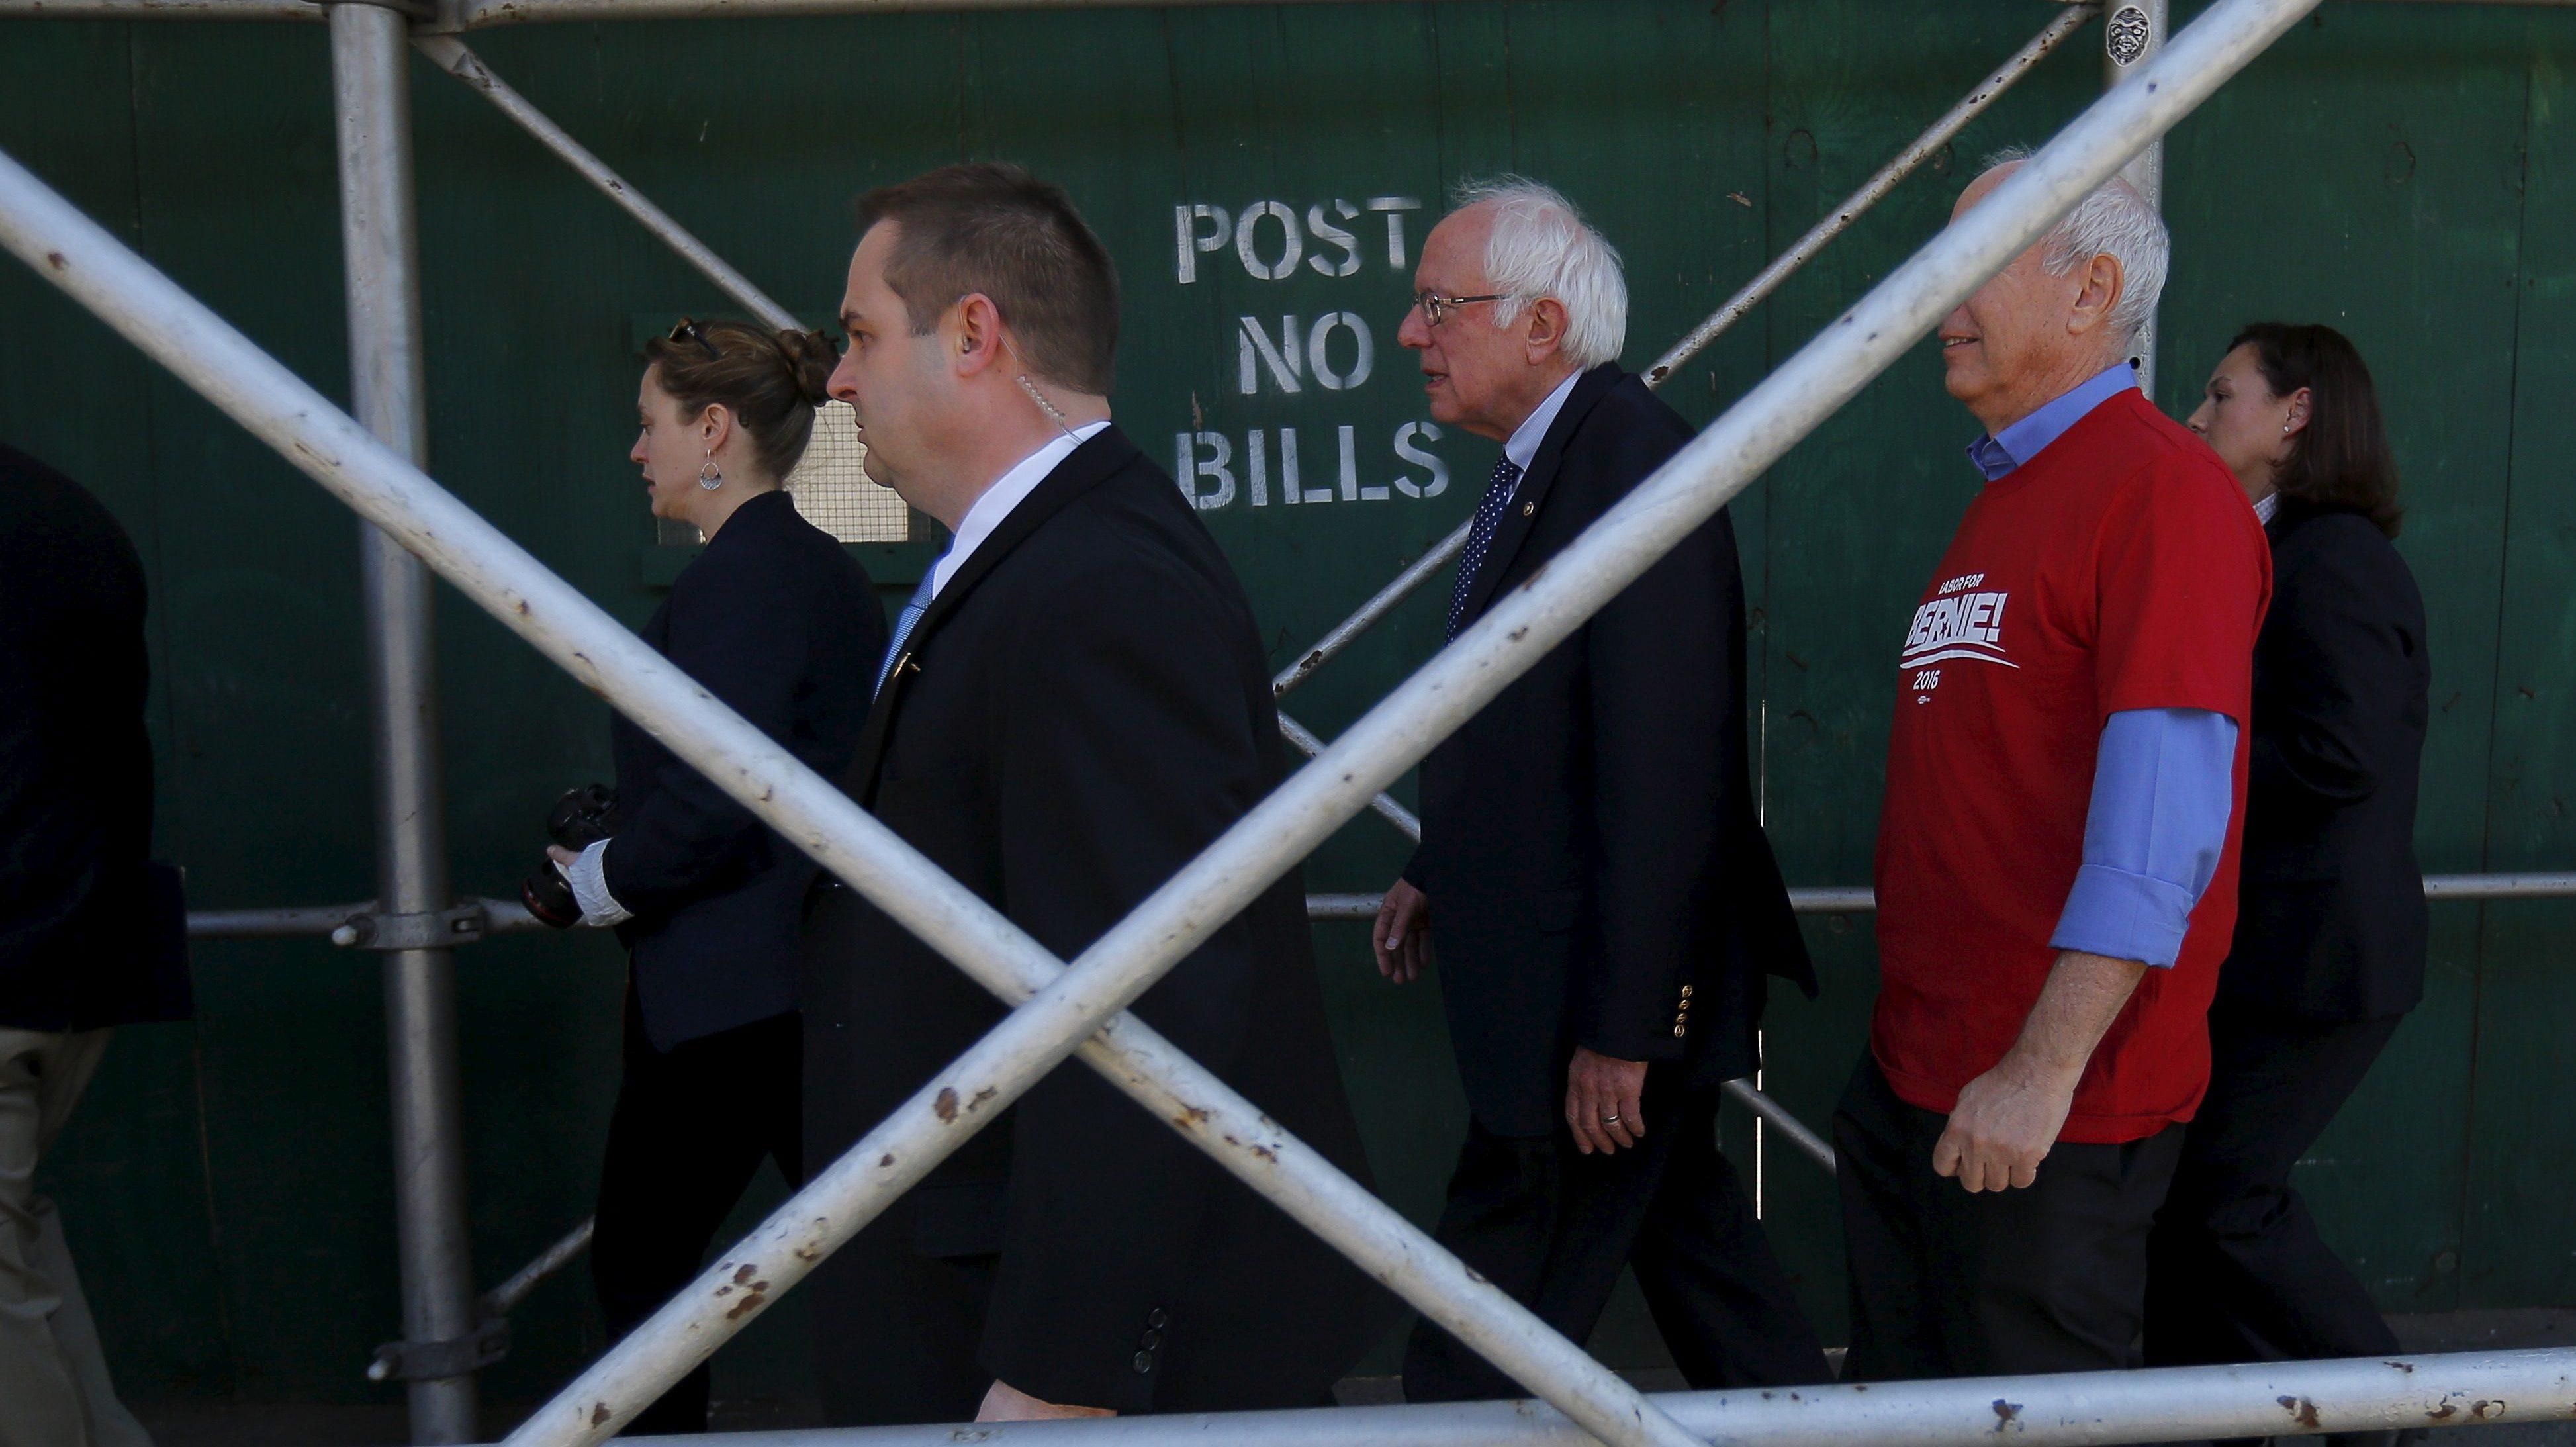 U.S. Democratic presidential candidate and U.S. Senator Bernie Sanders